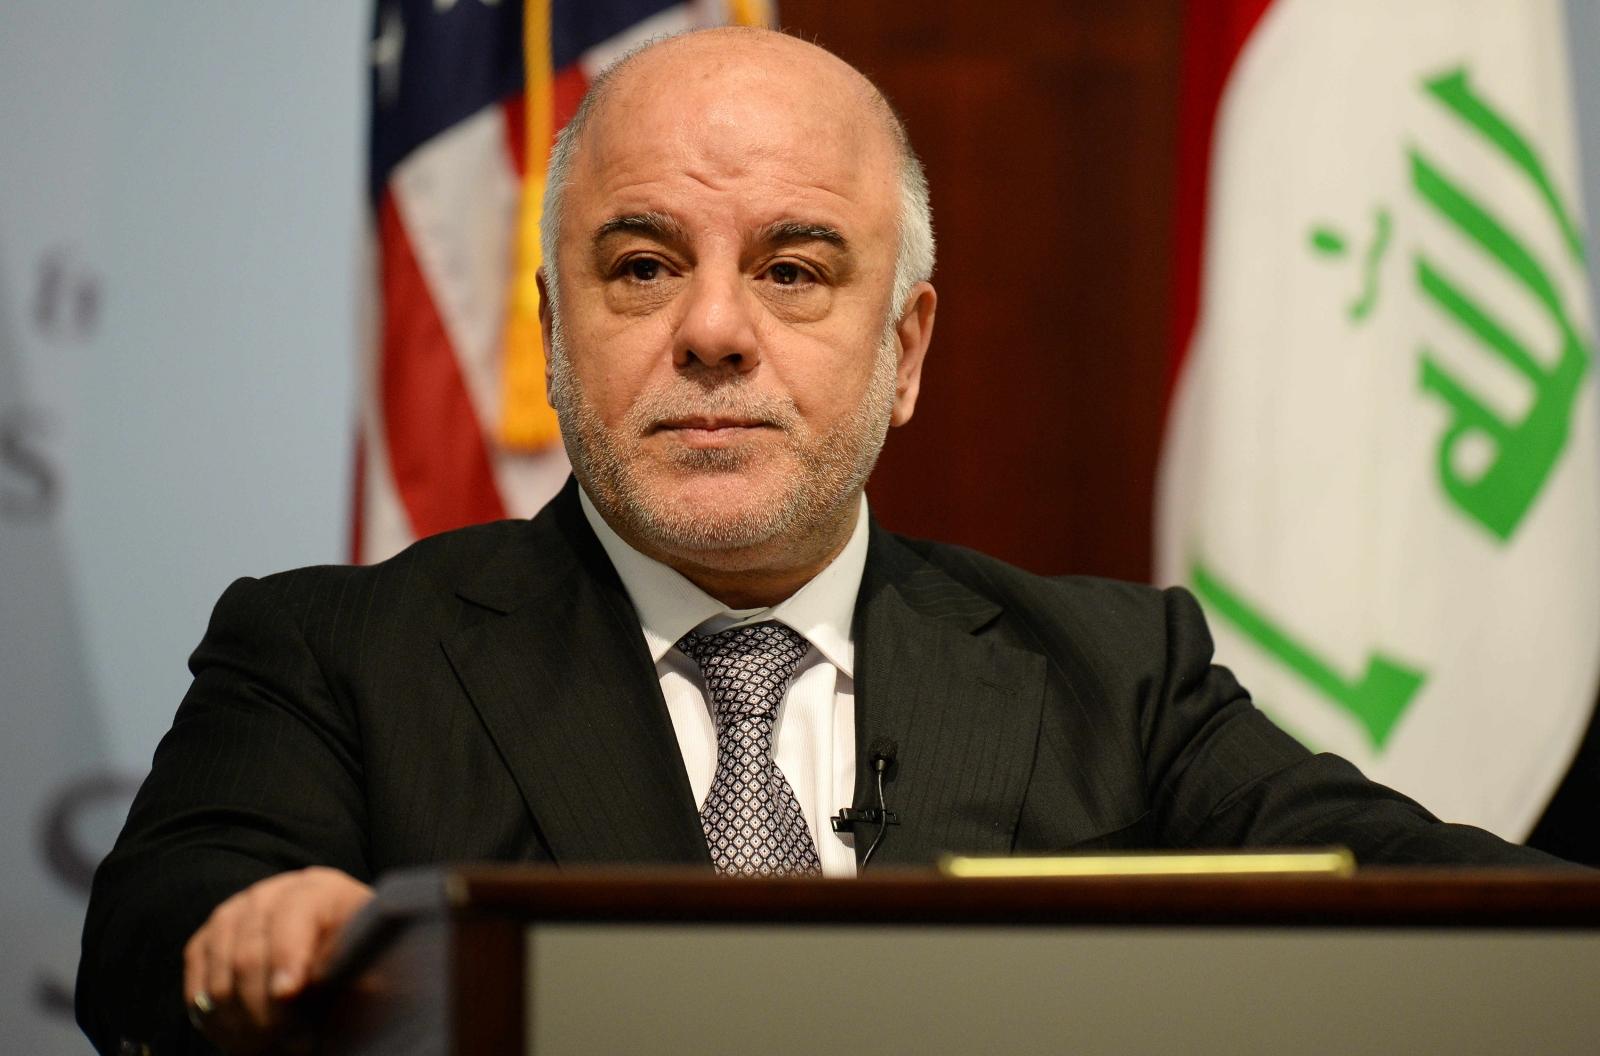 Di Balik Pernyataan Irak, Masalah ISIS Telah Selesai